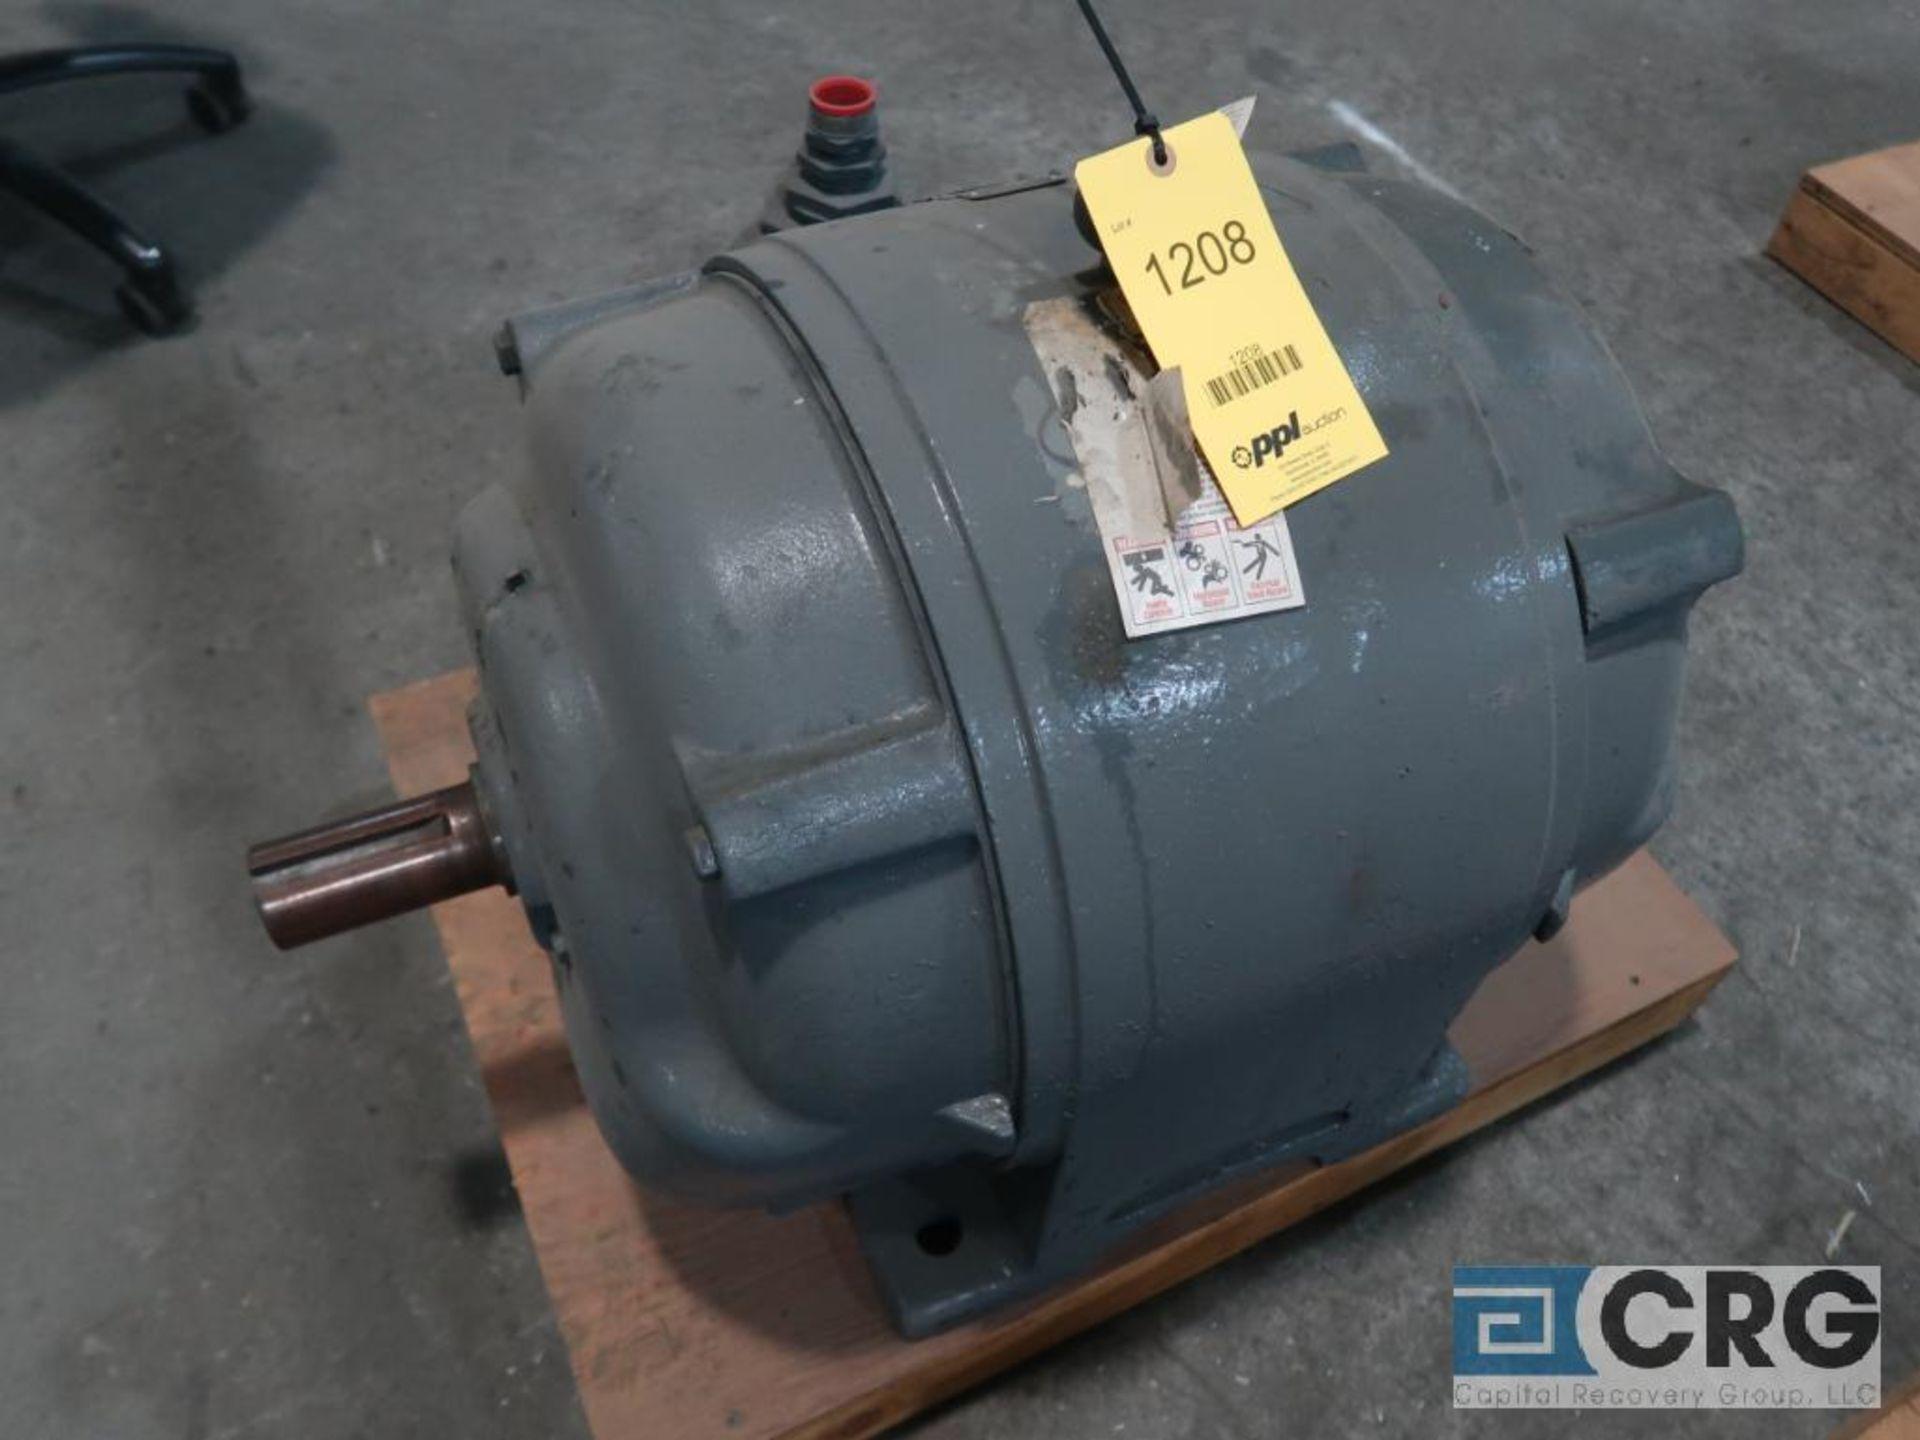 U.S. Electrical Motors Uniclosed motor, 60 HP, 1,500/1,800 RPMs, 440 volt, 3 ph., 404US frame (